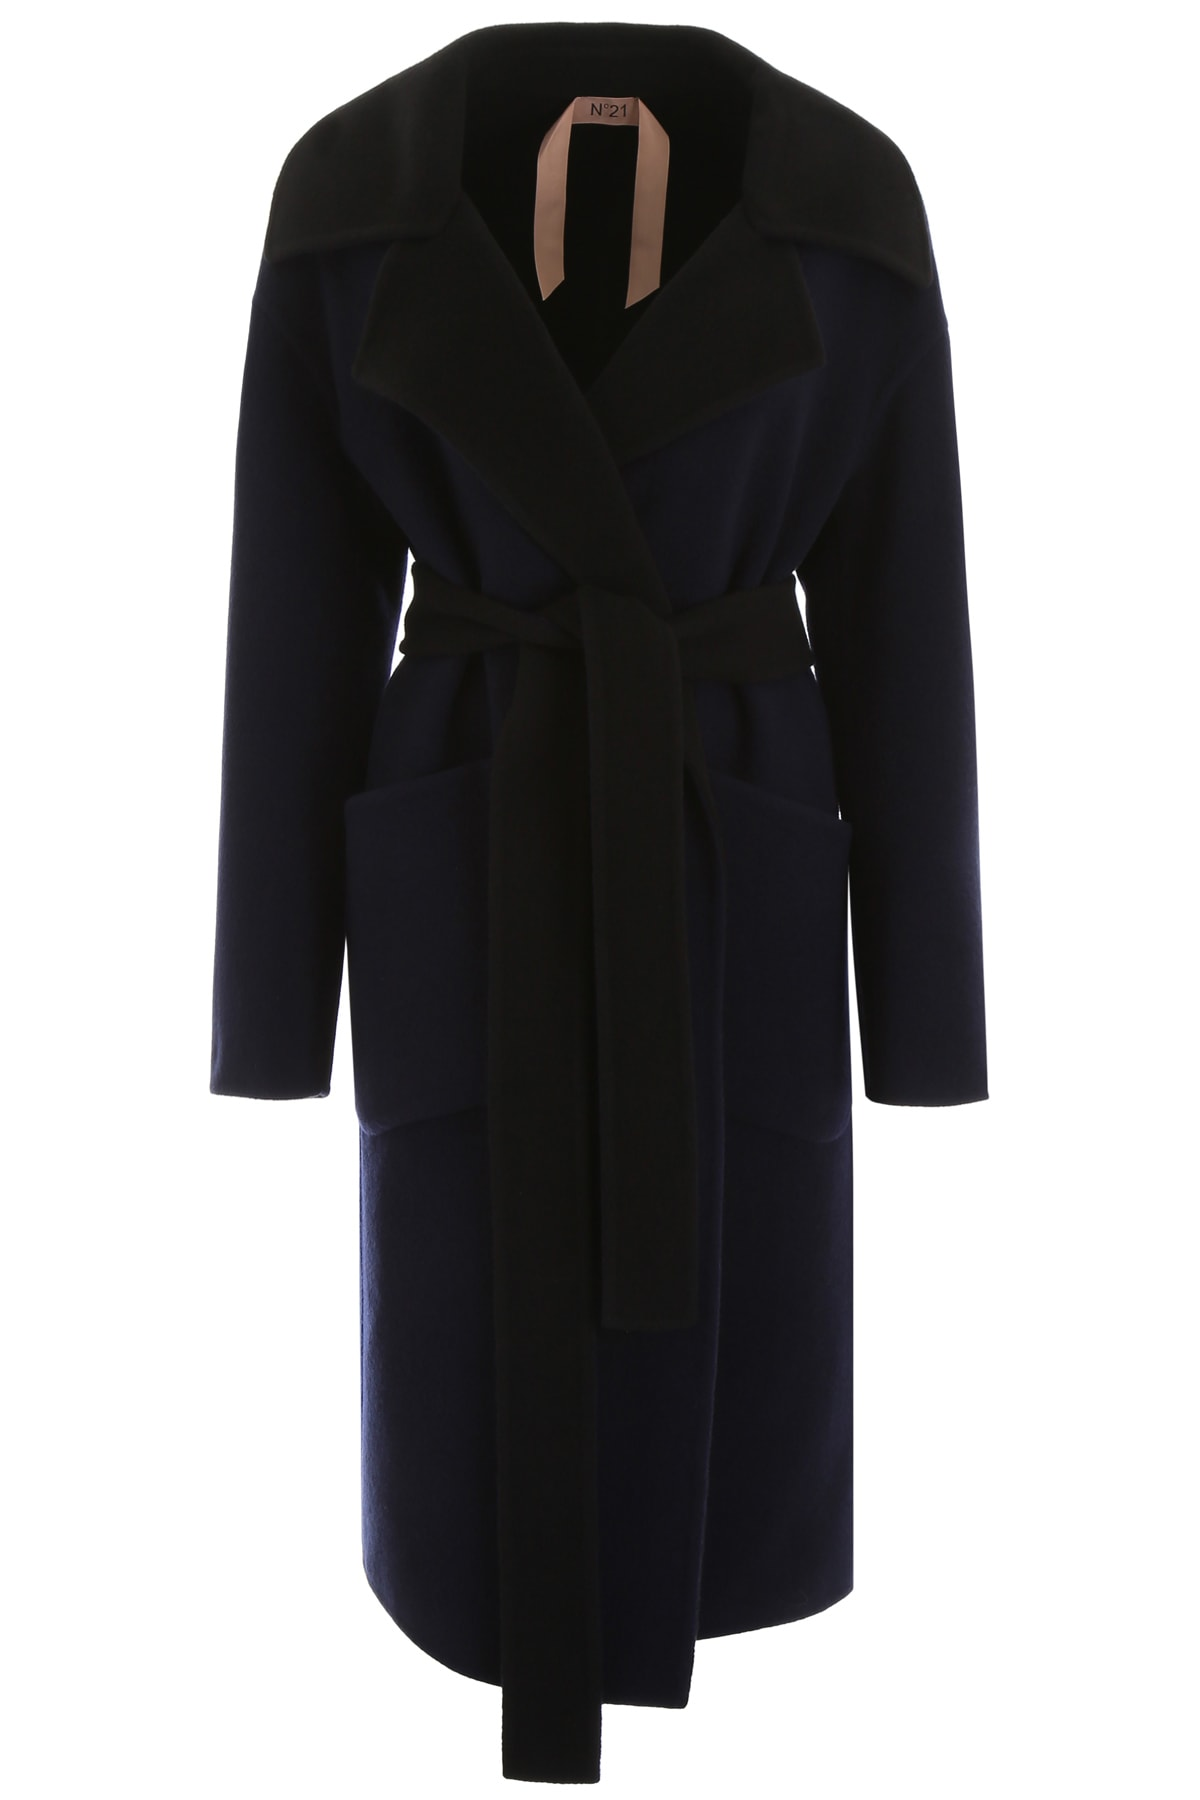 N.21 Bicolor Coat